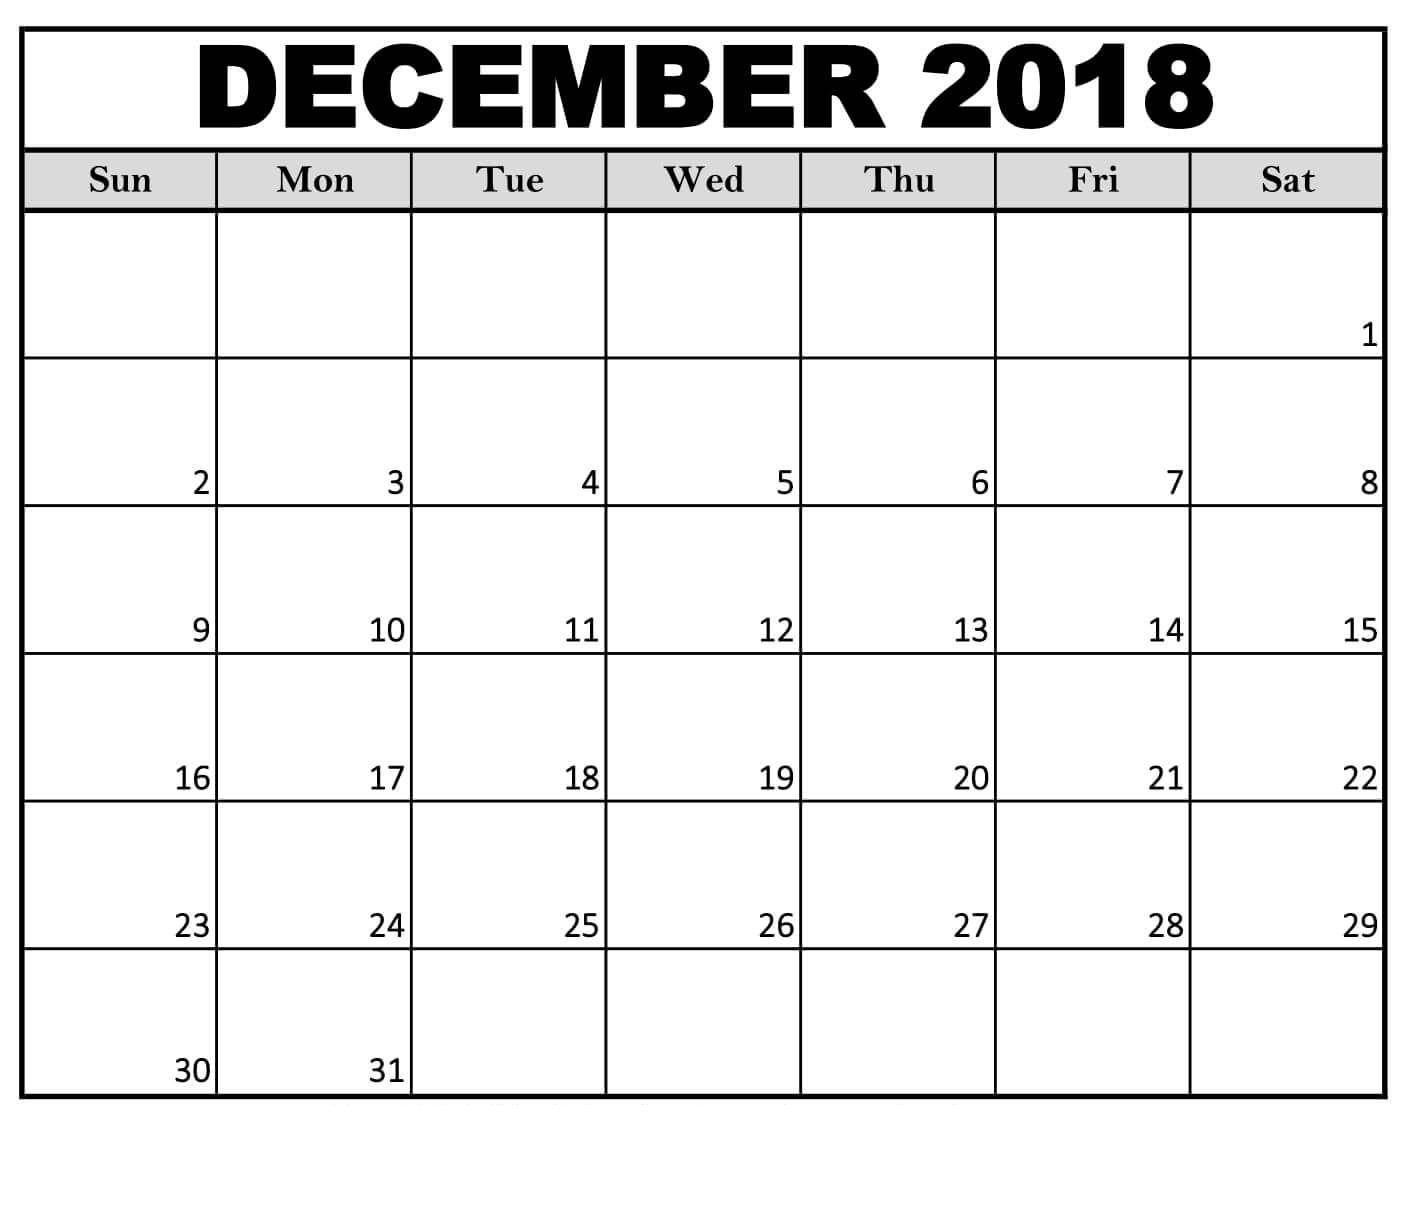 December 2018 Calendar Weekly Template Printable Calendar